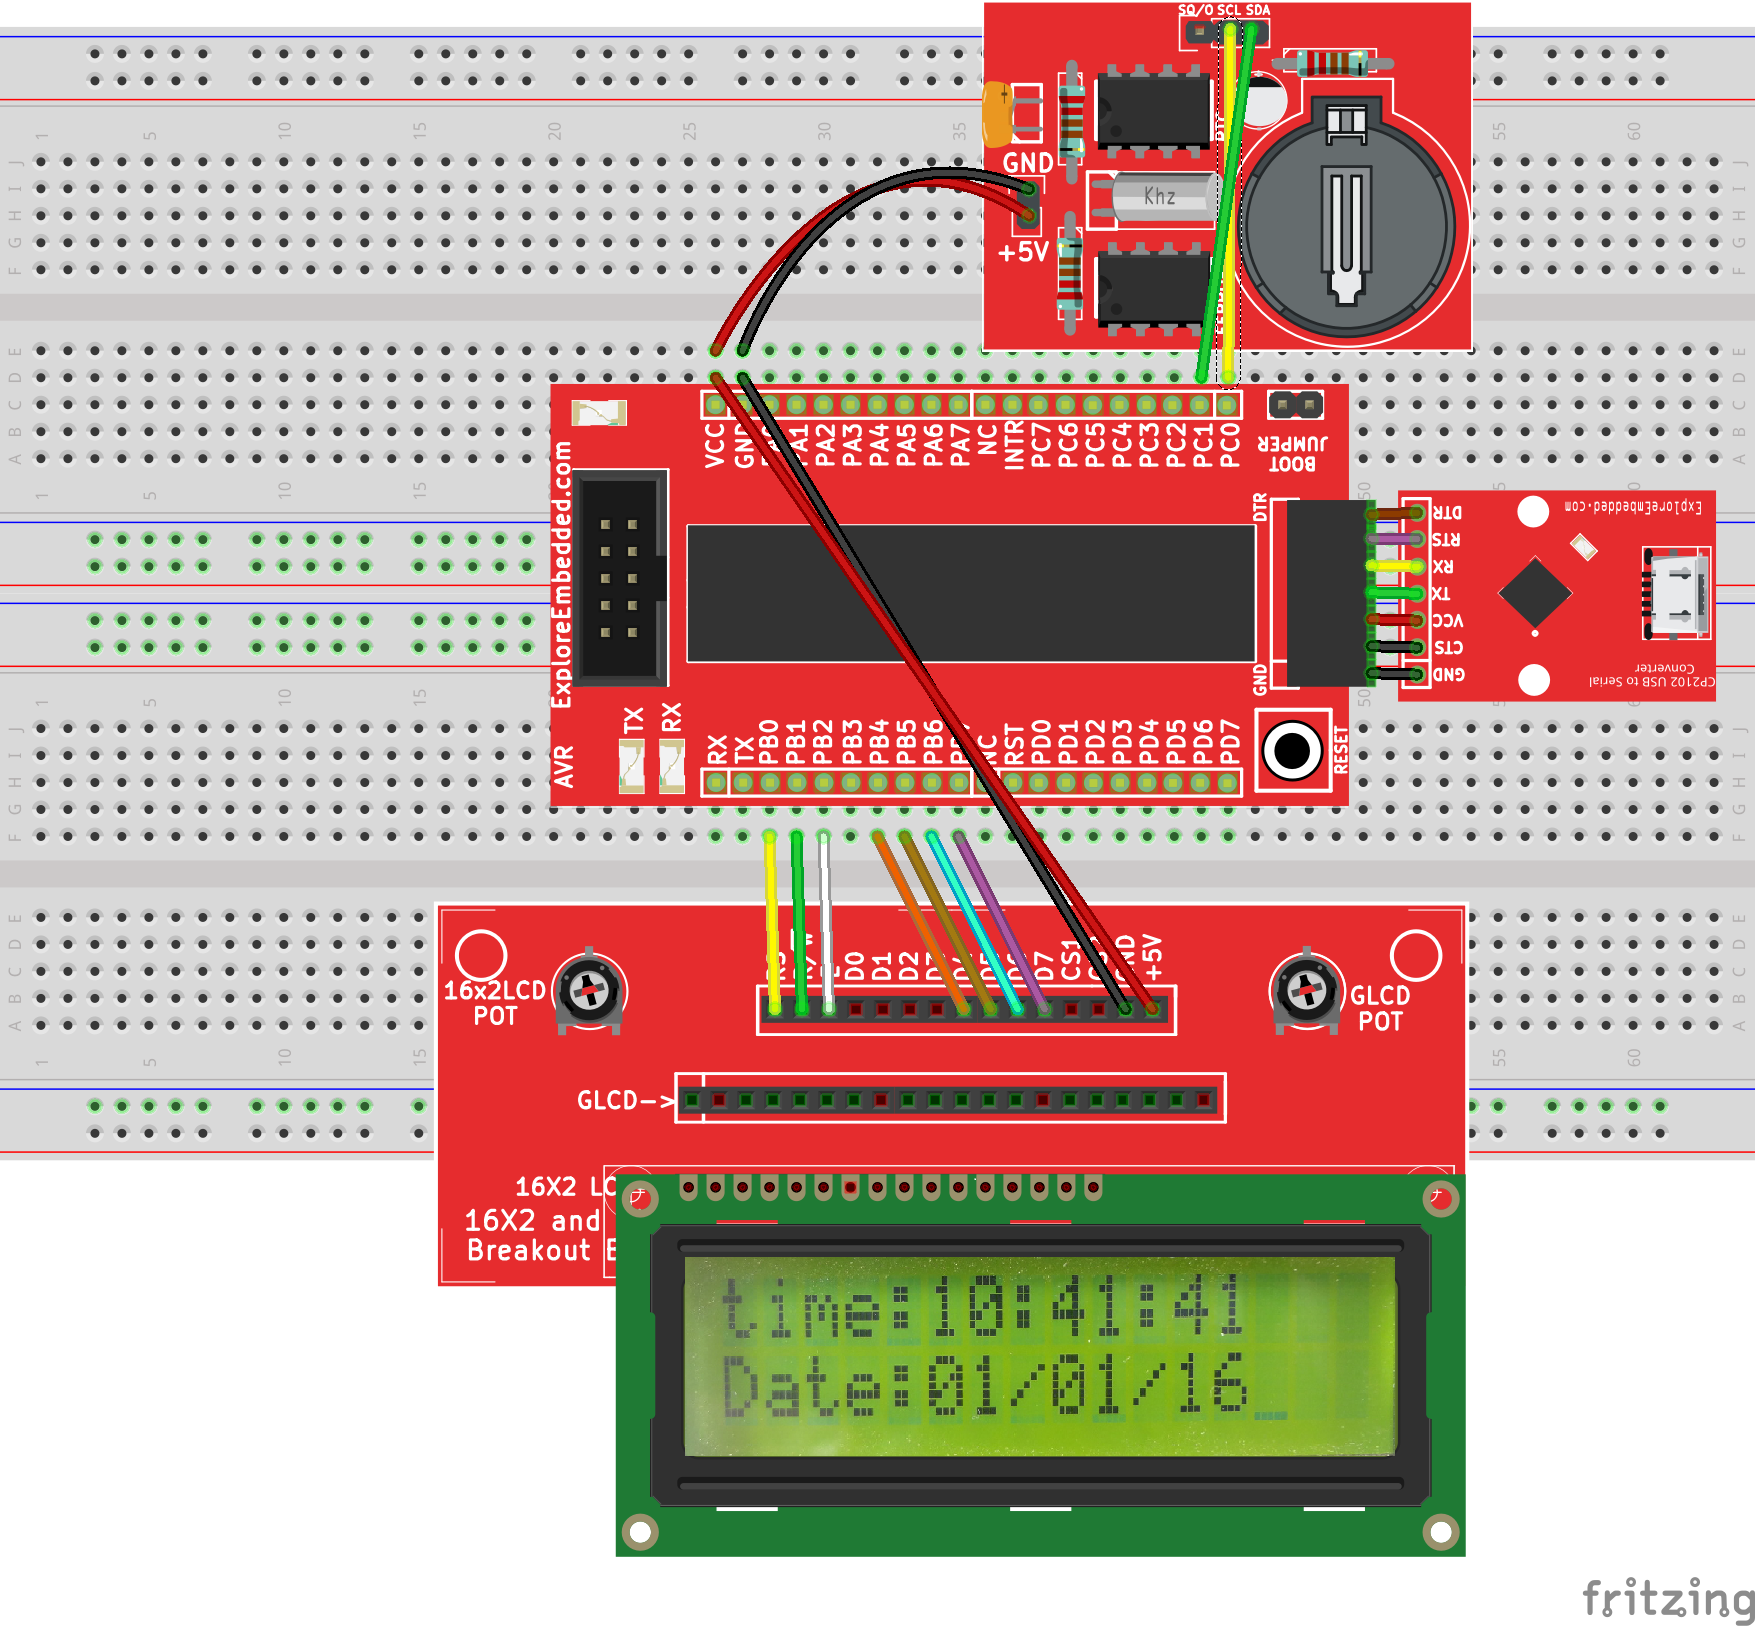 Interfacing Rtc With Avr Breakout Tutorials Digital Clock Using 8051 Microcontroller Ds1307 0 Avrbreakout